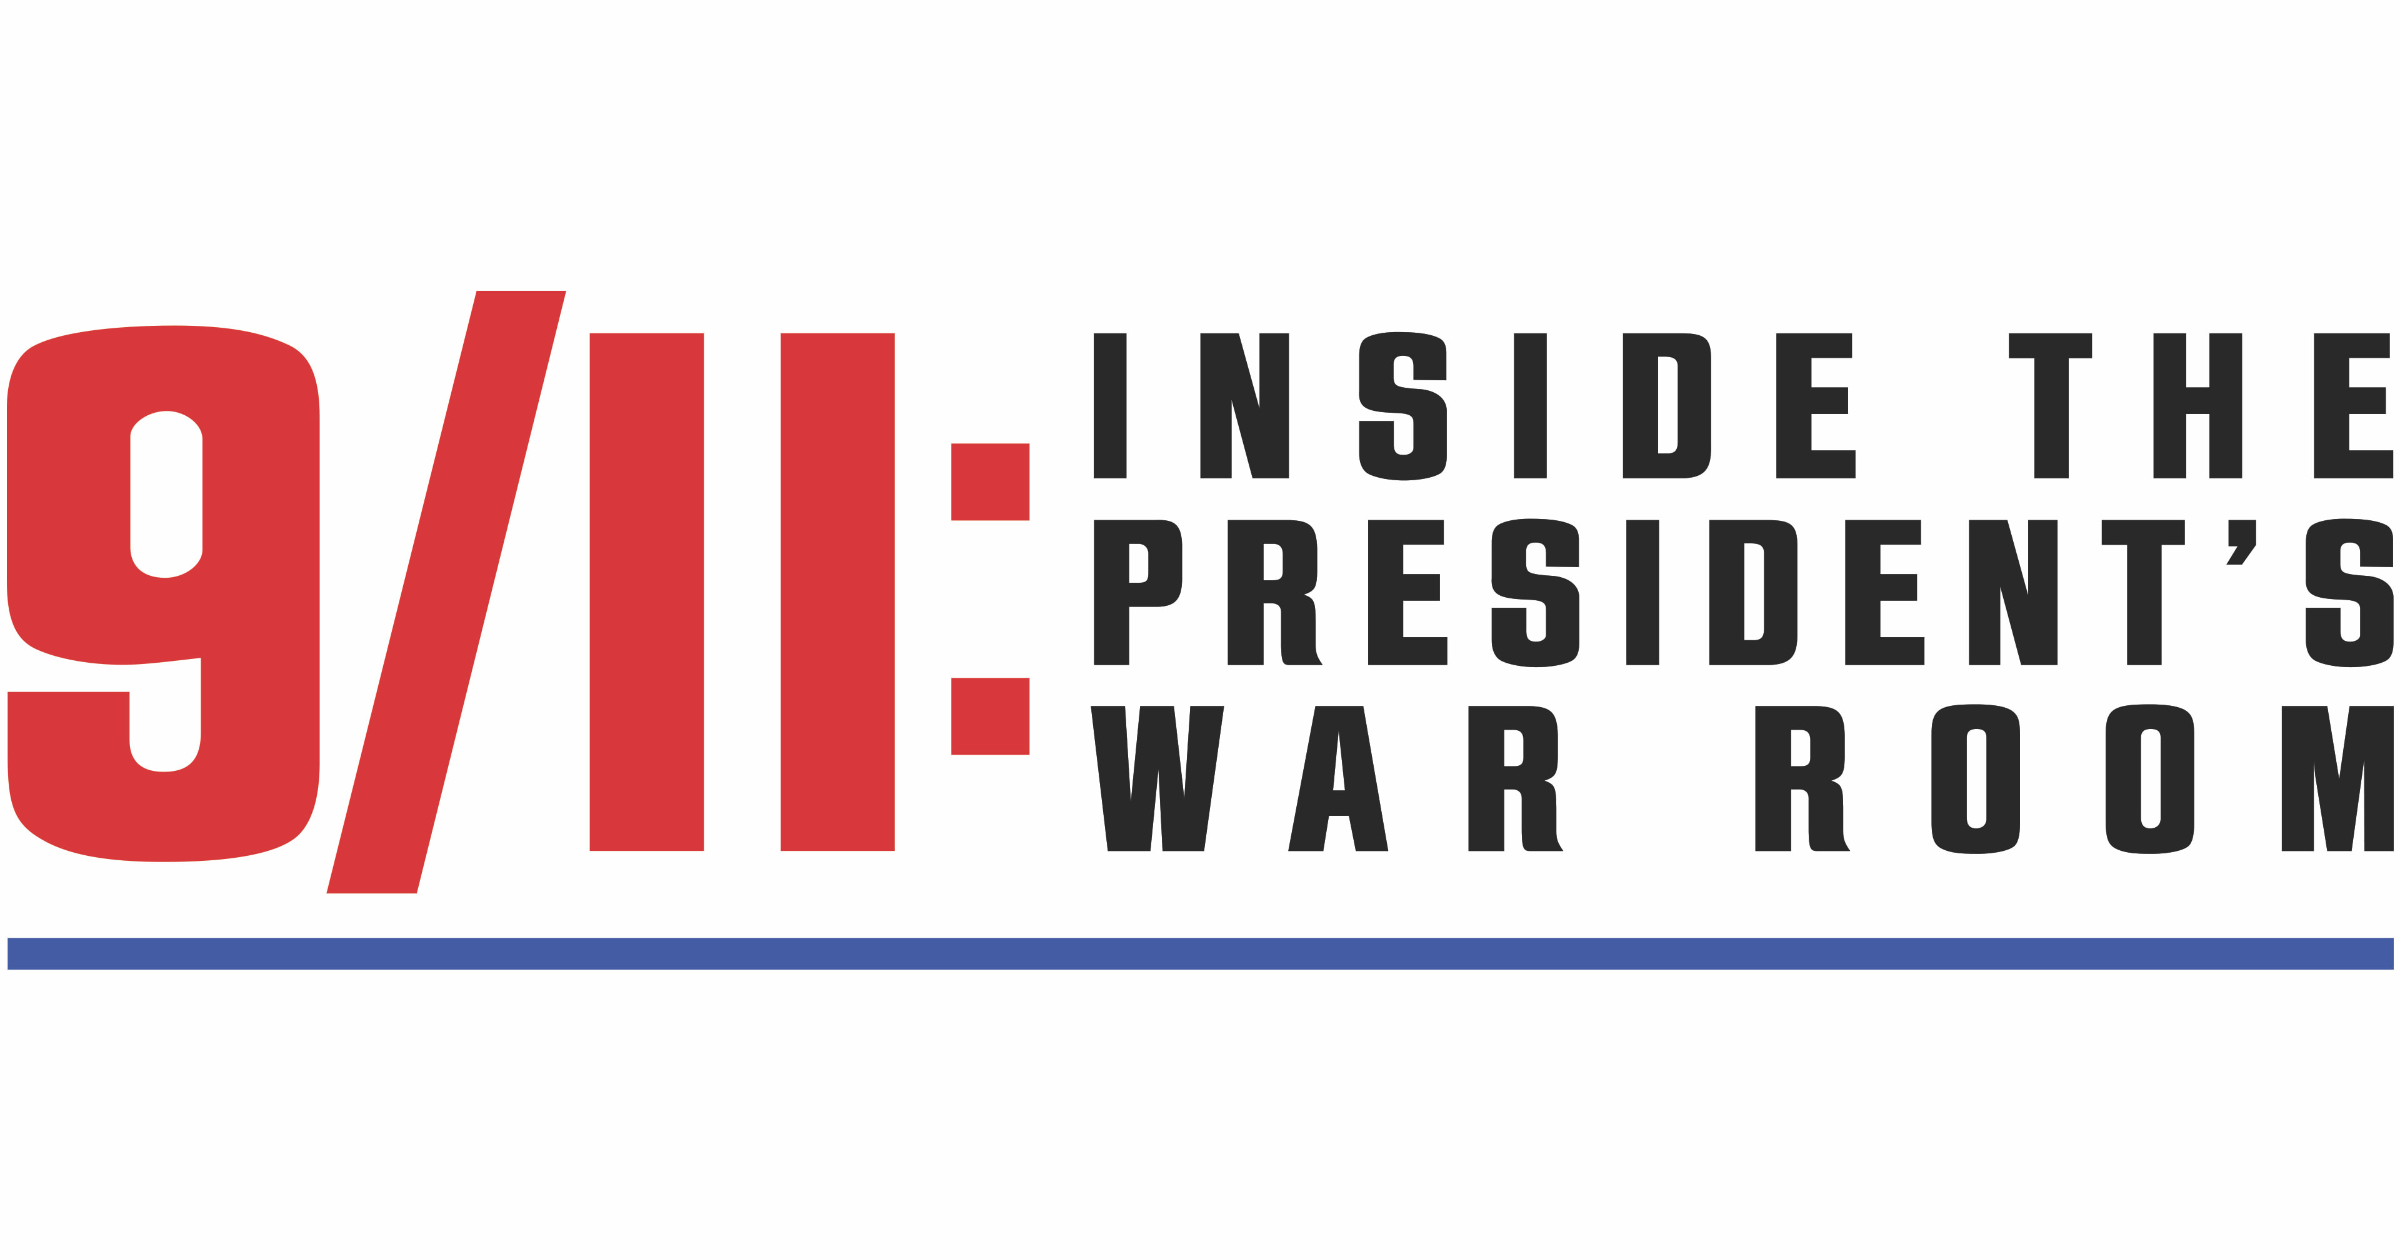 9:11 inside the presidents war room on Apple TV+